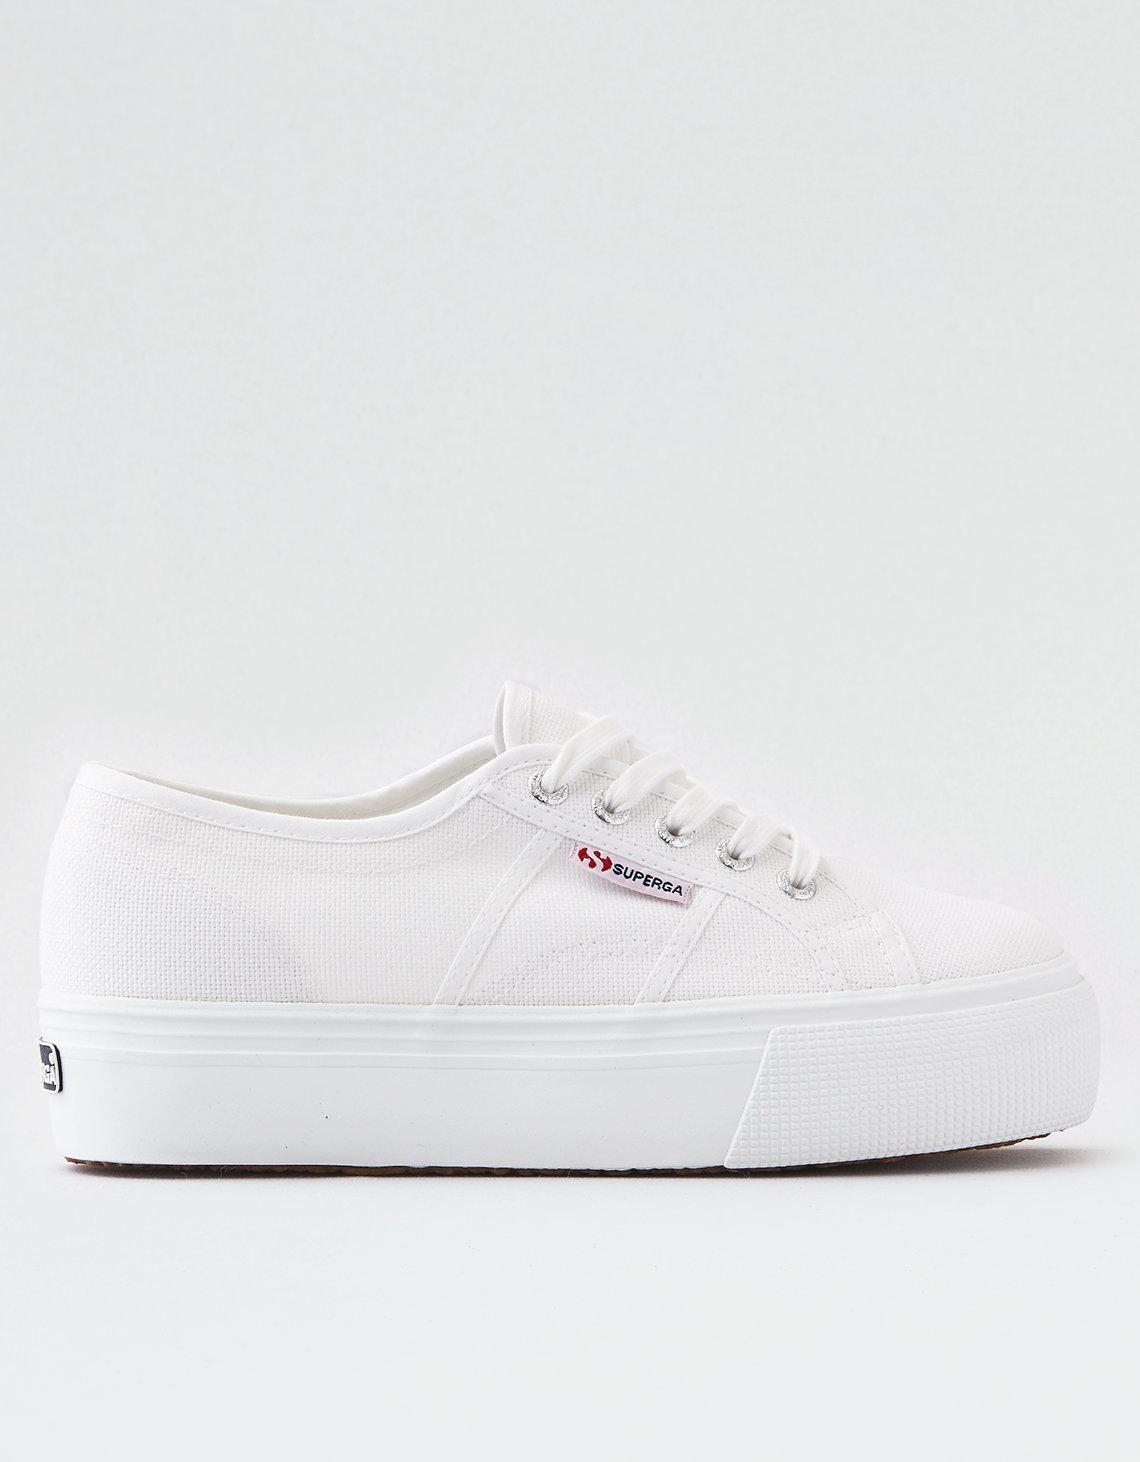 976435b61e61 Lyst - American Eagle Superga 2790 Platform Sneaker in White